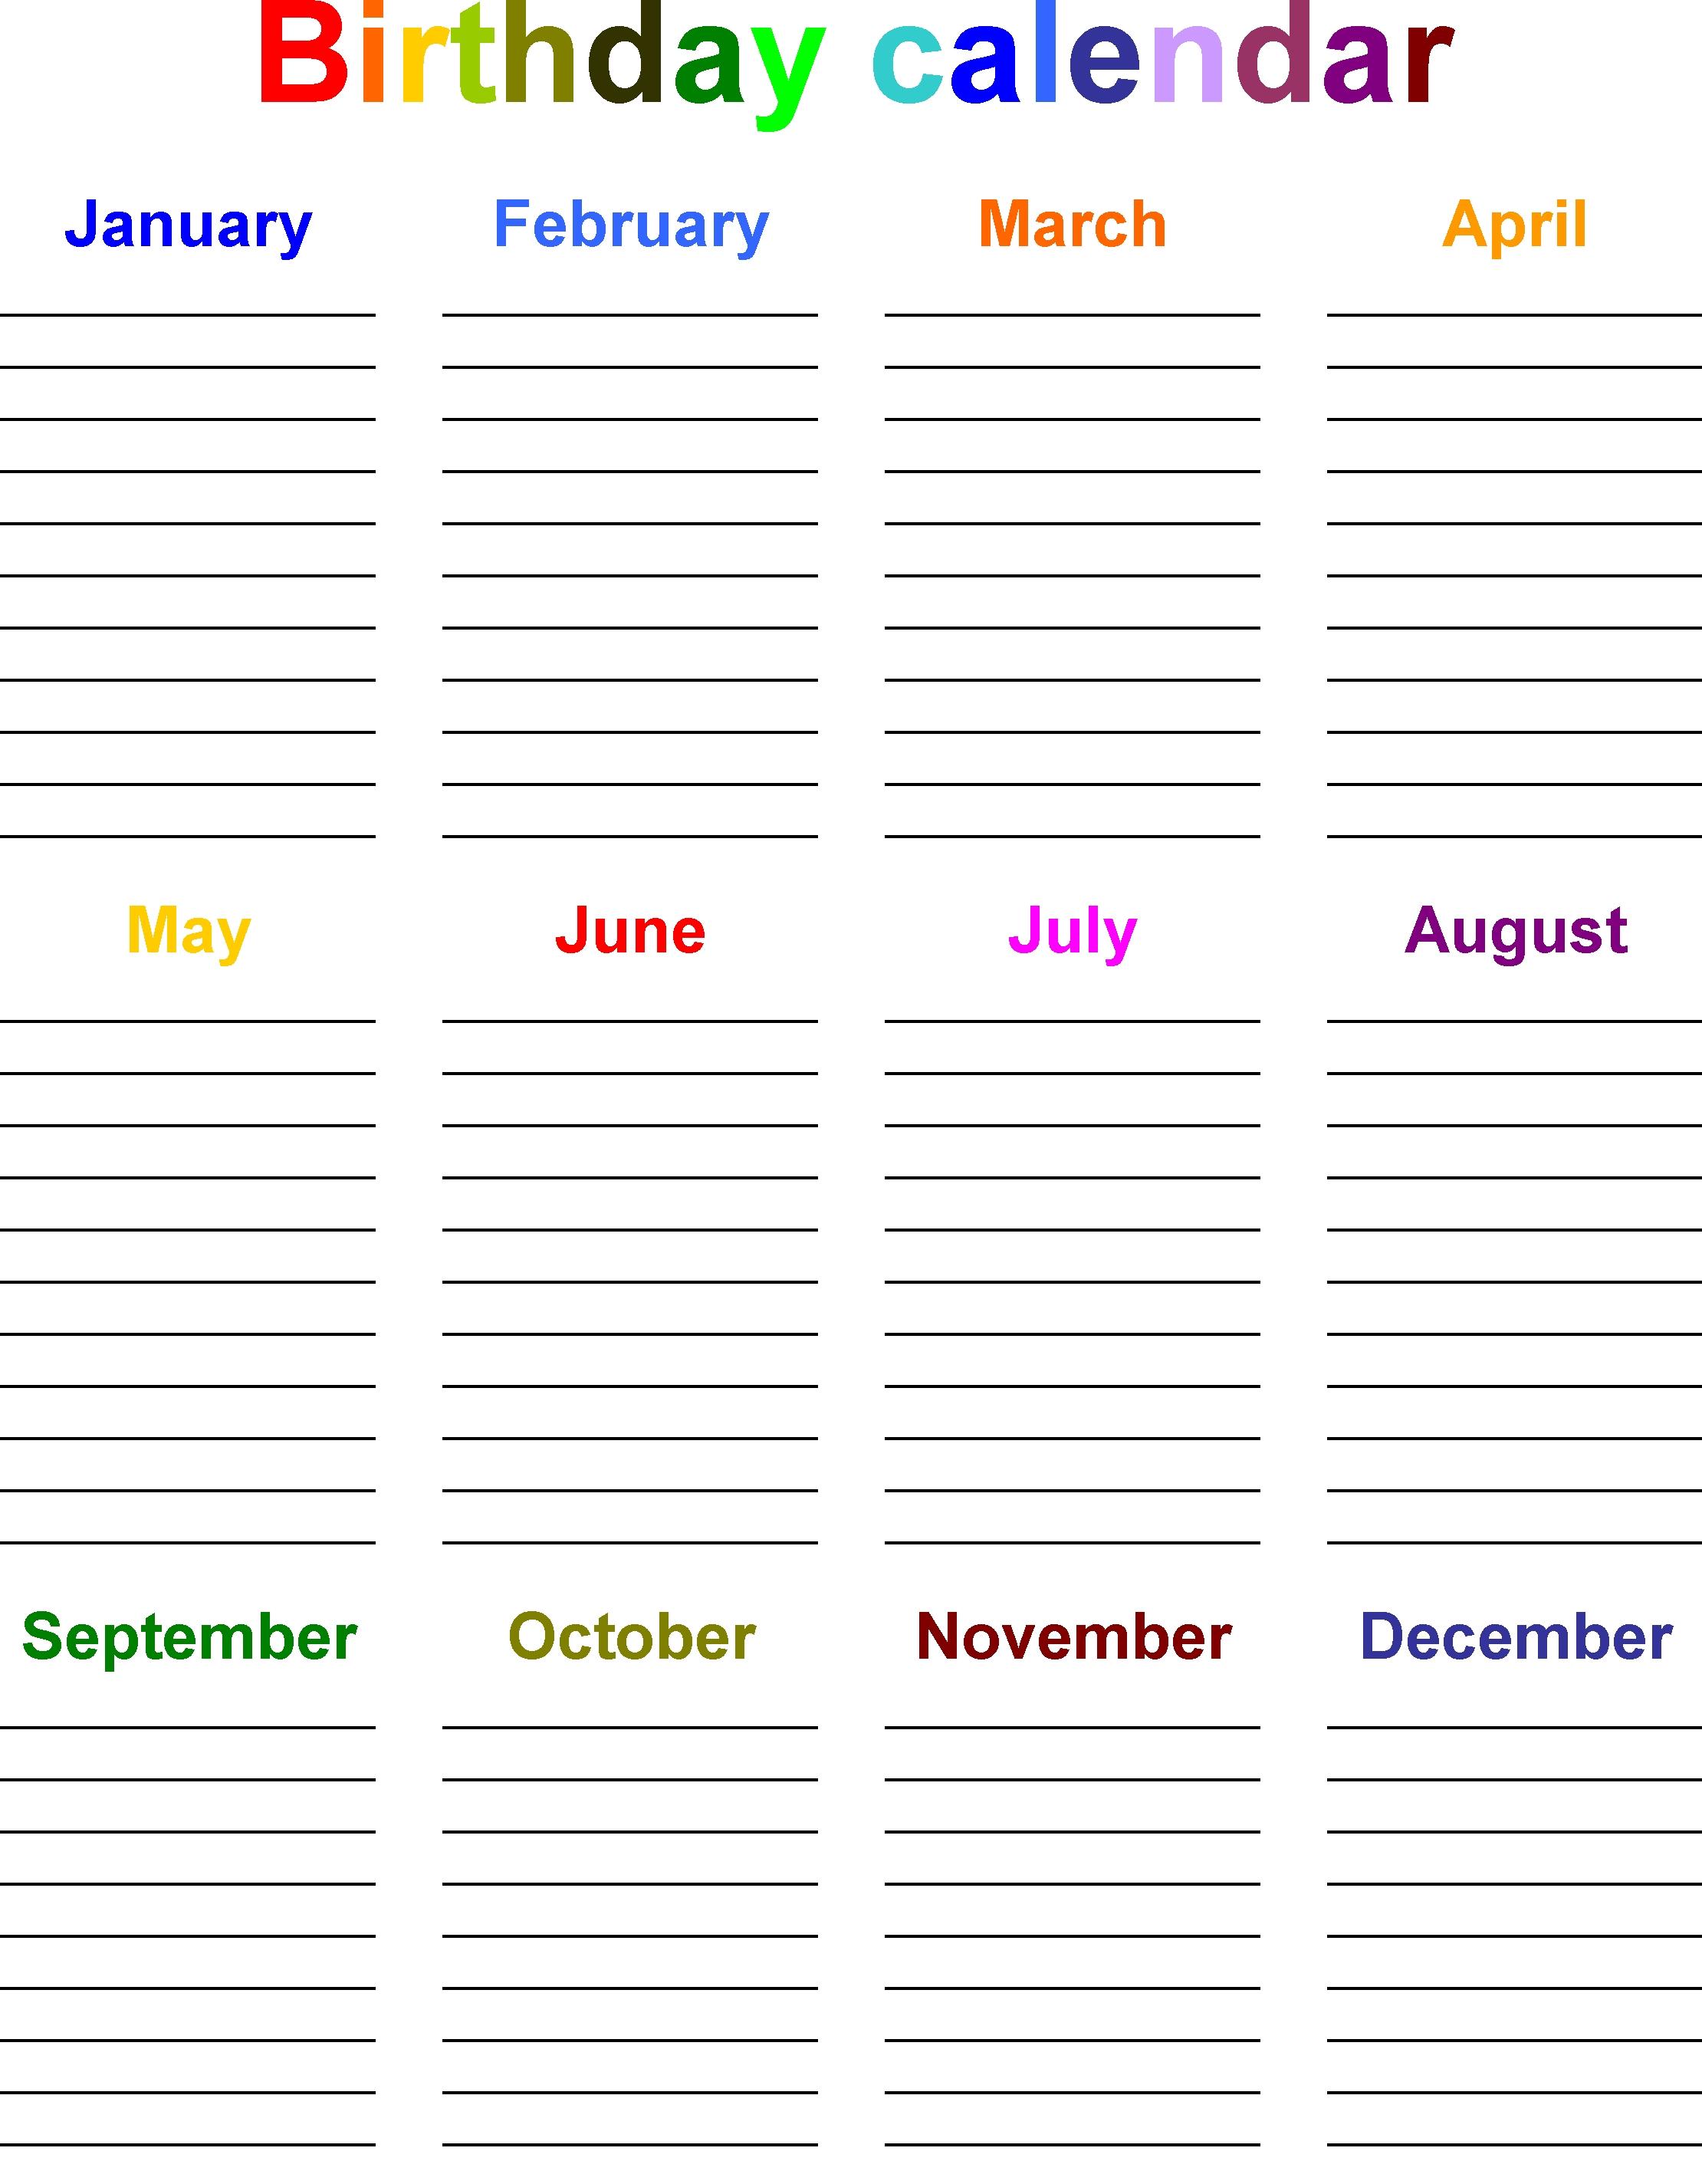 Birthday Calendar Template Free Microsoft Word   Calendar